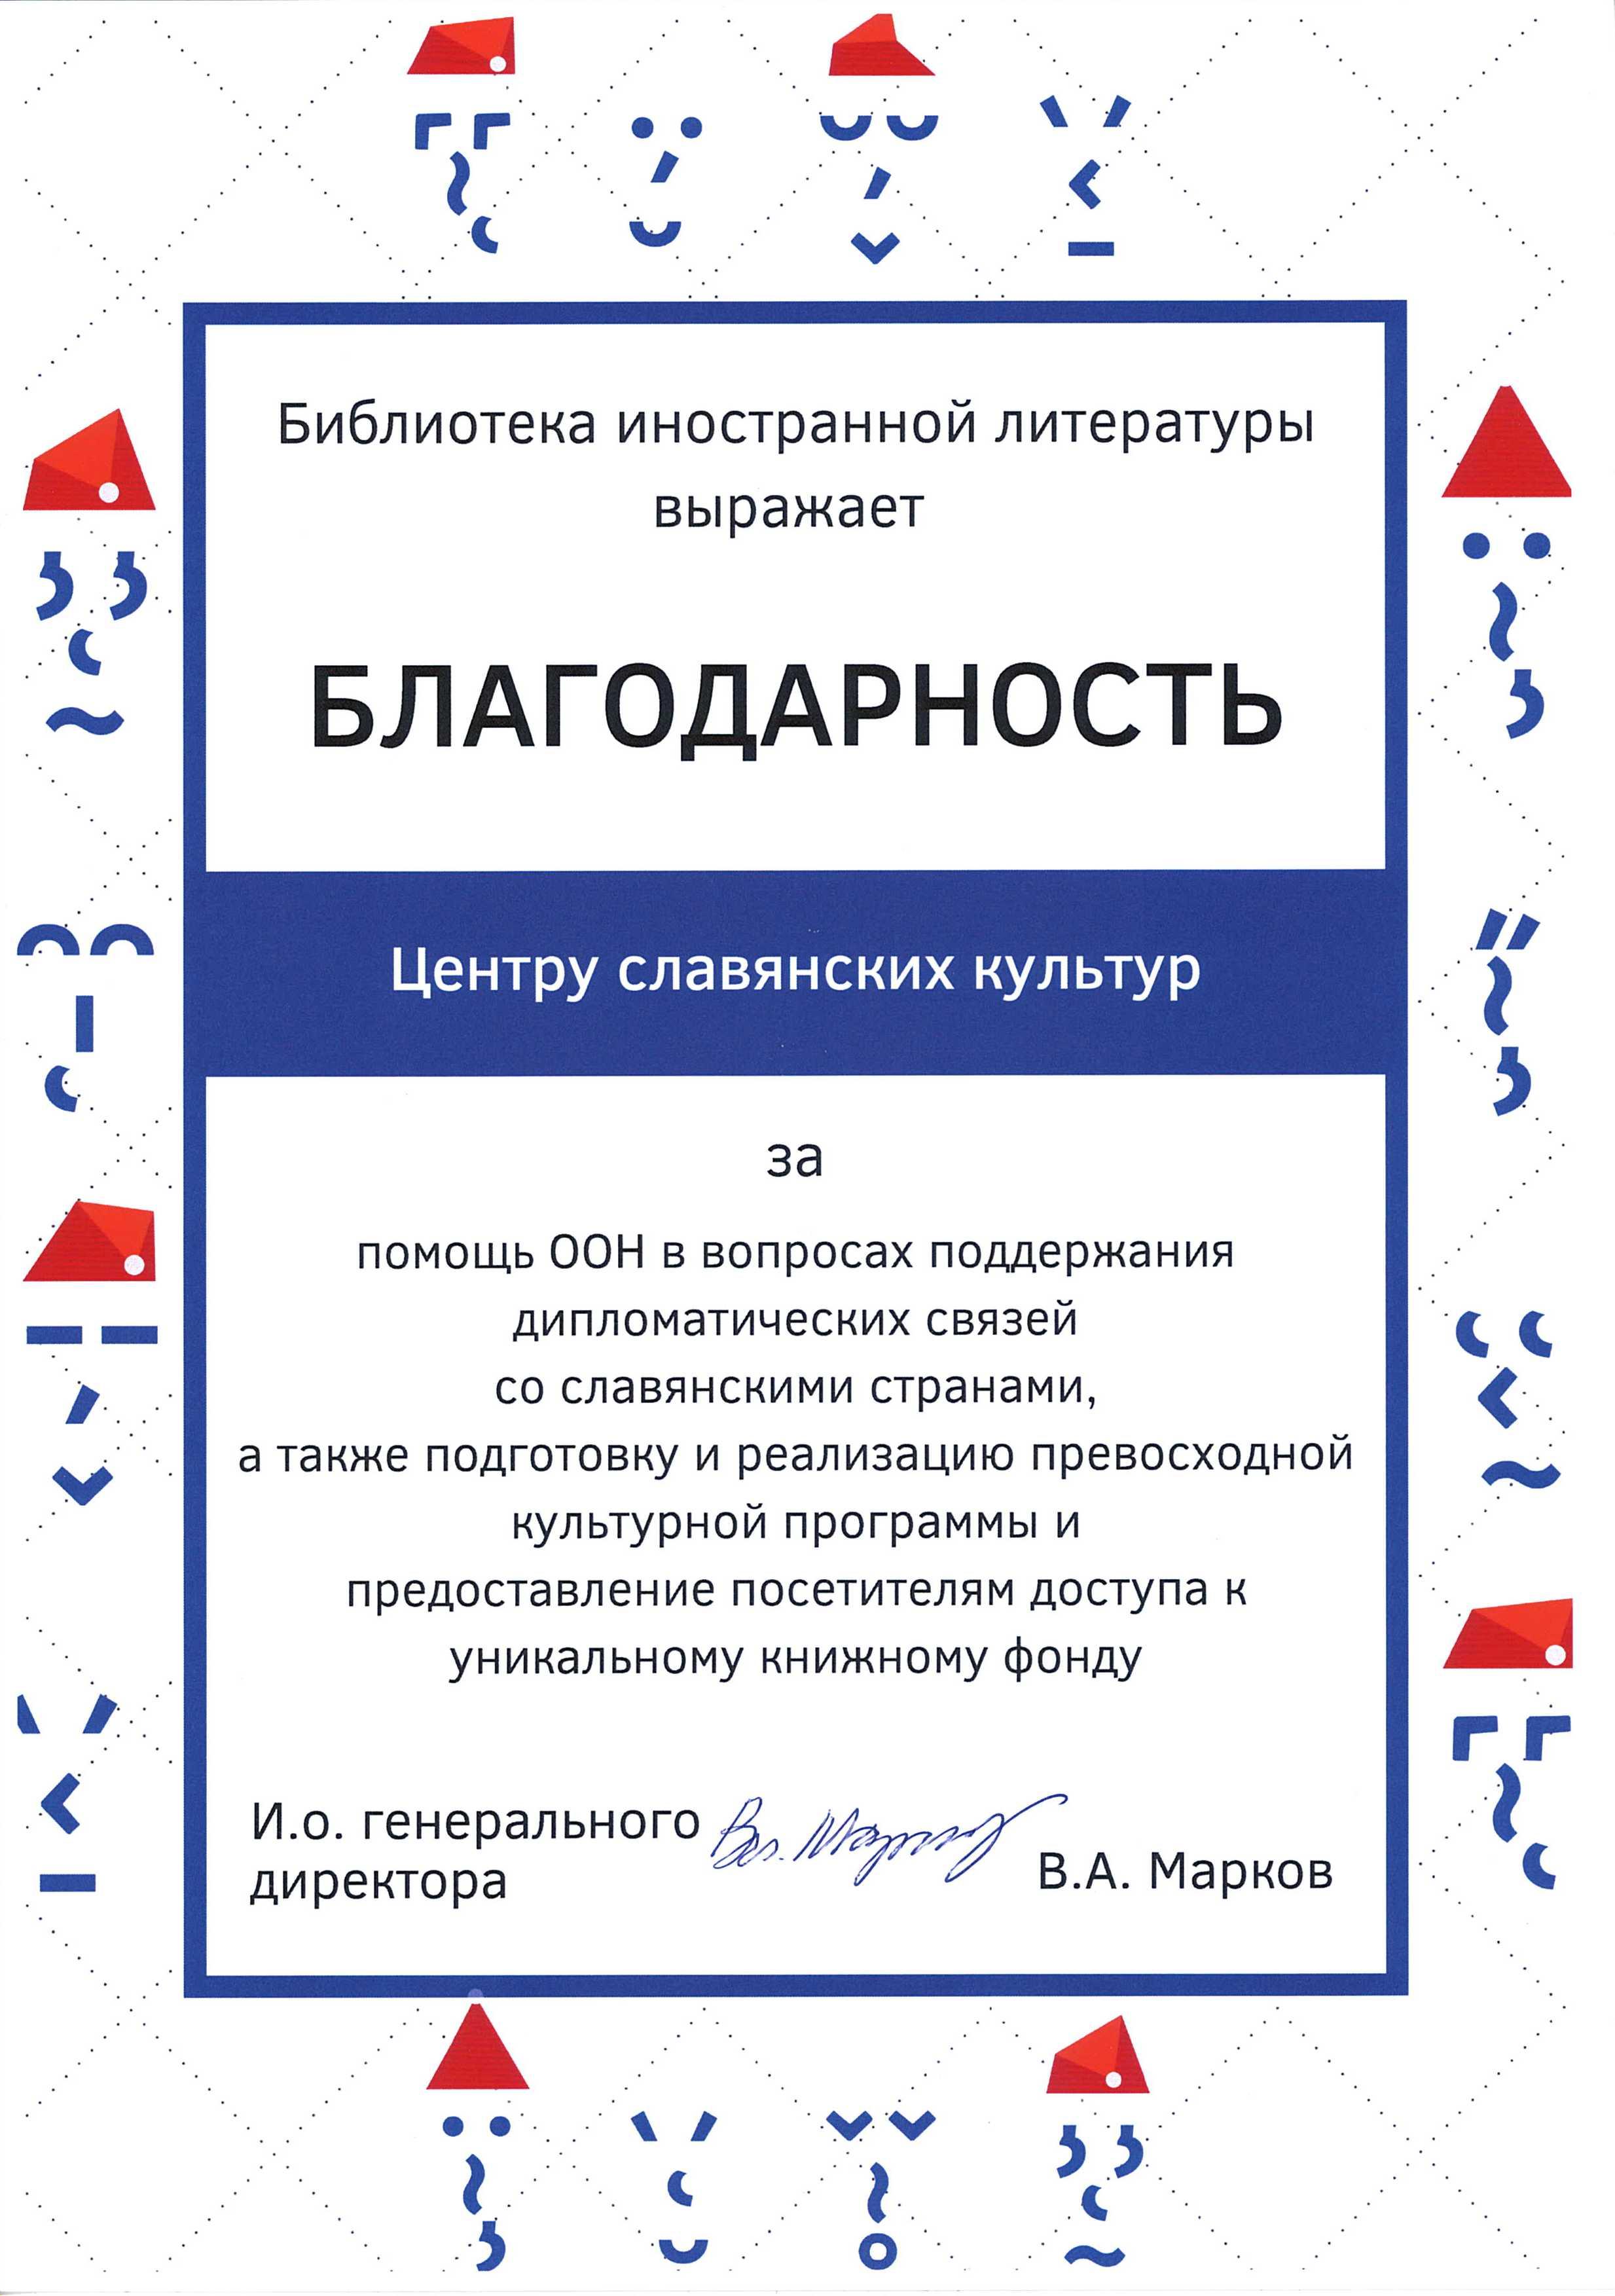 Благодарность ЦСК от Маркова